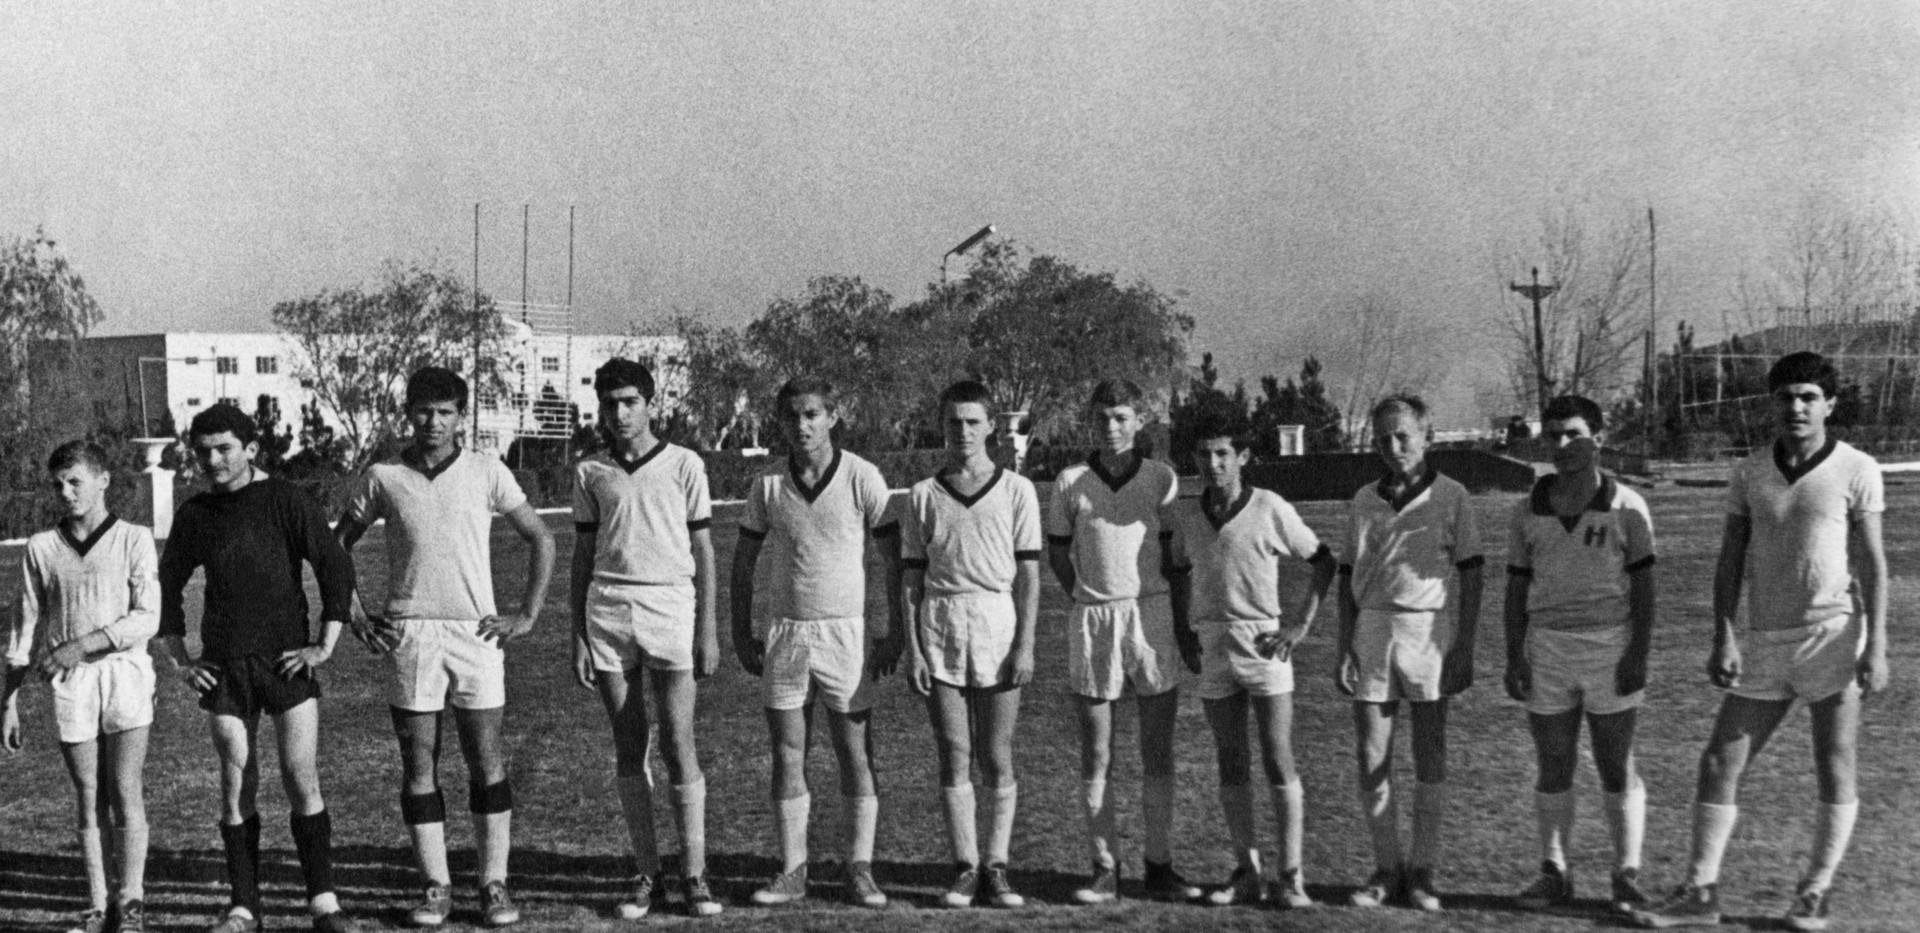 USSR-Unior-Mirzoyan-12.jpg